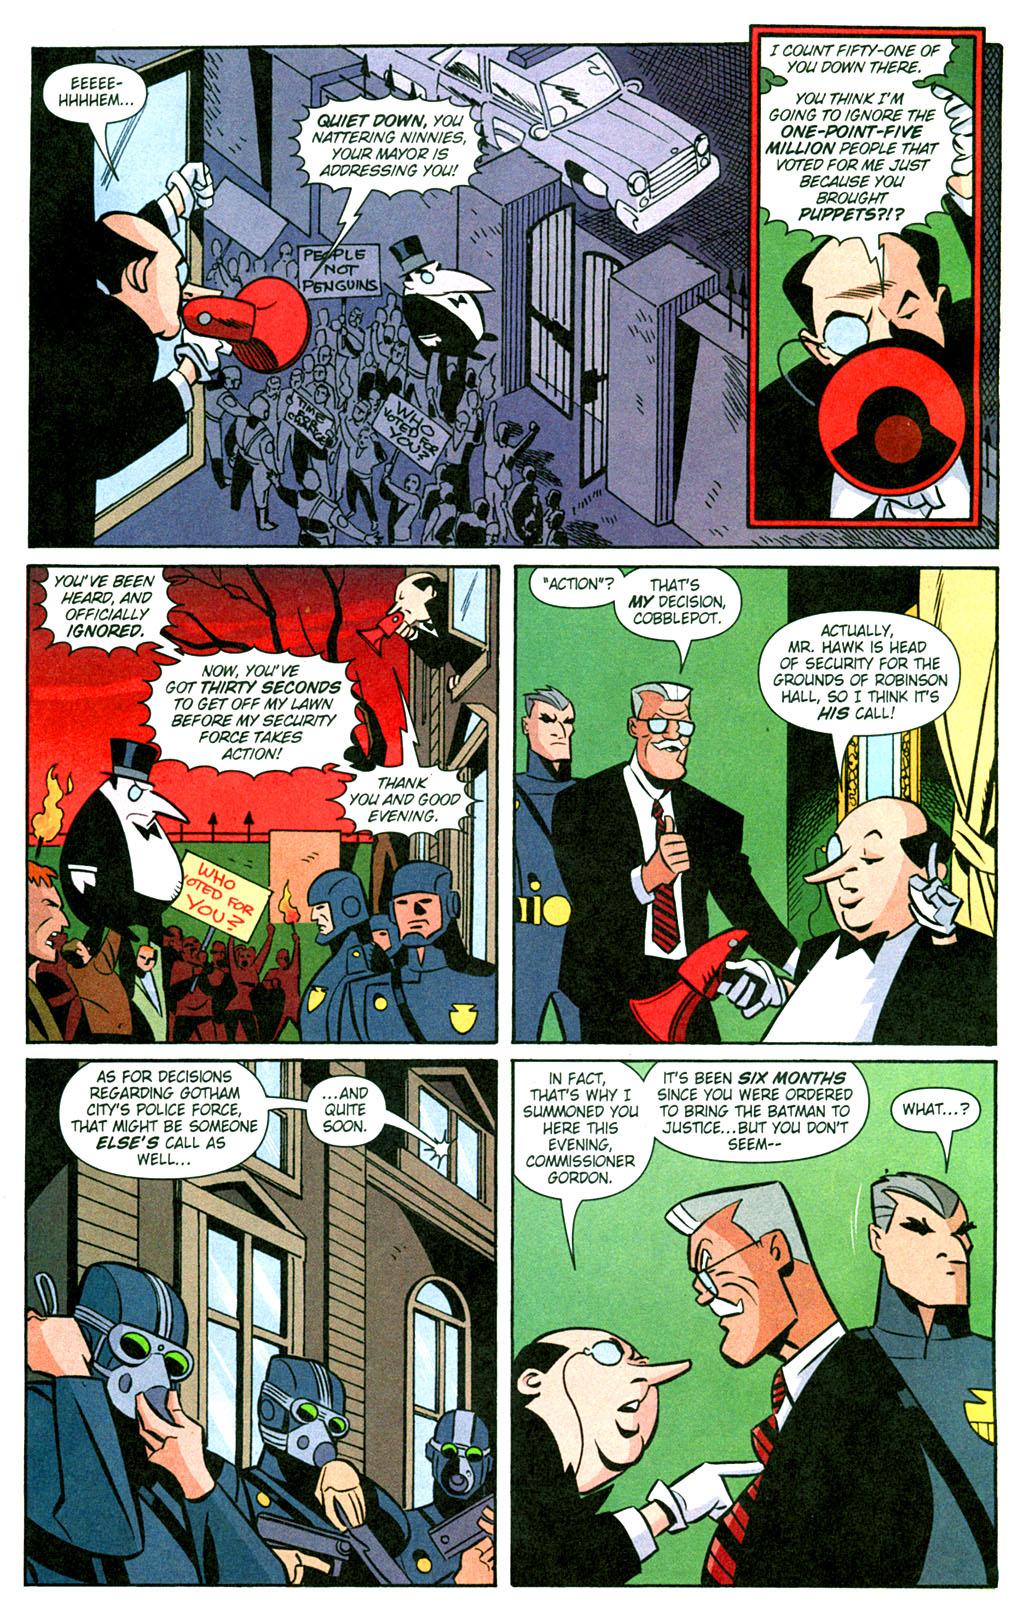 read online batman adventures 2003 comic issue 13